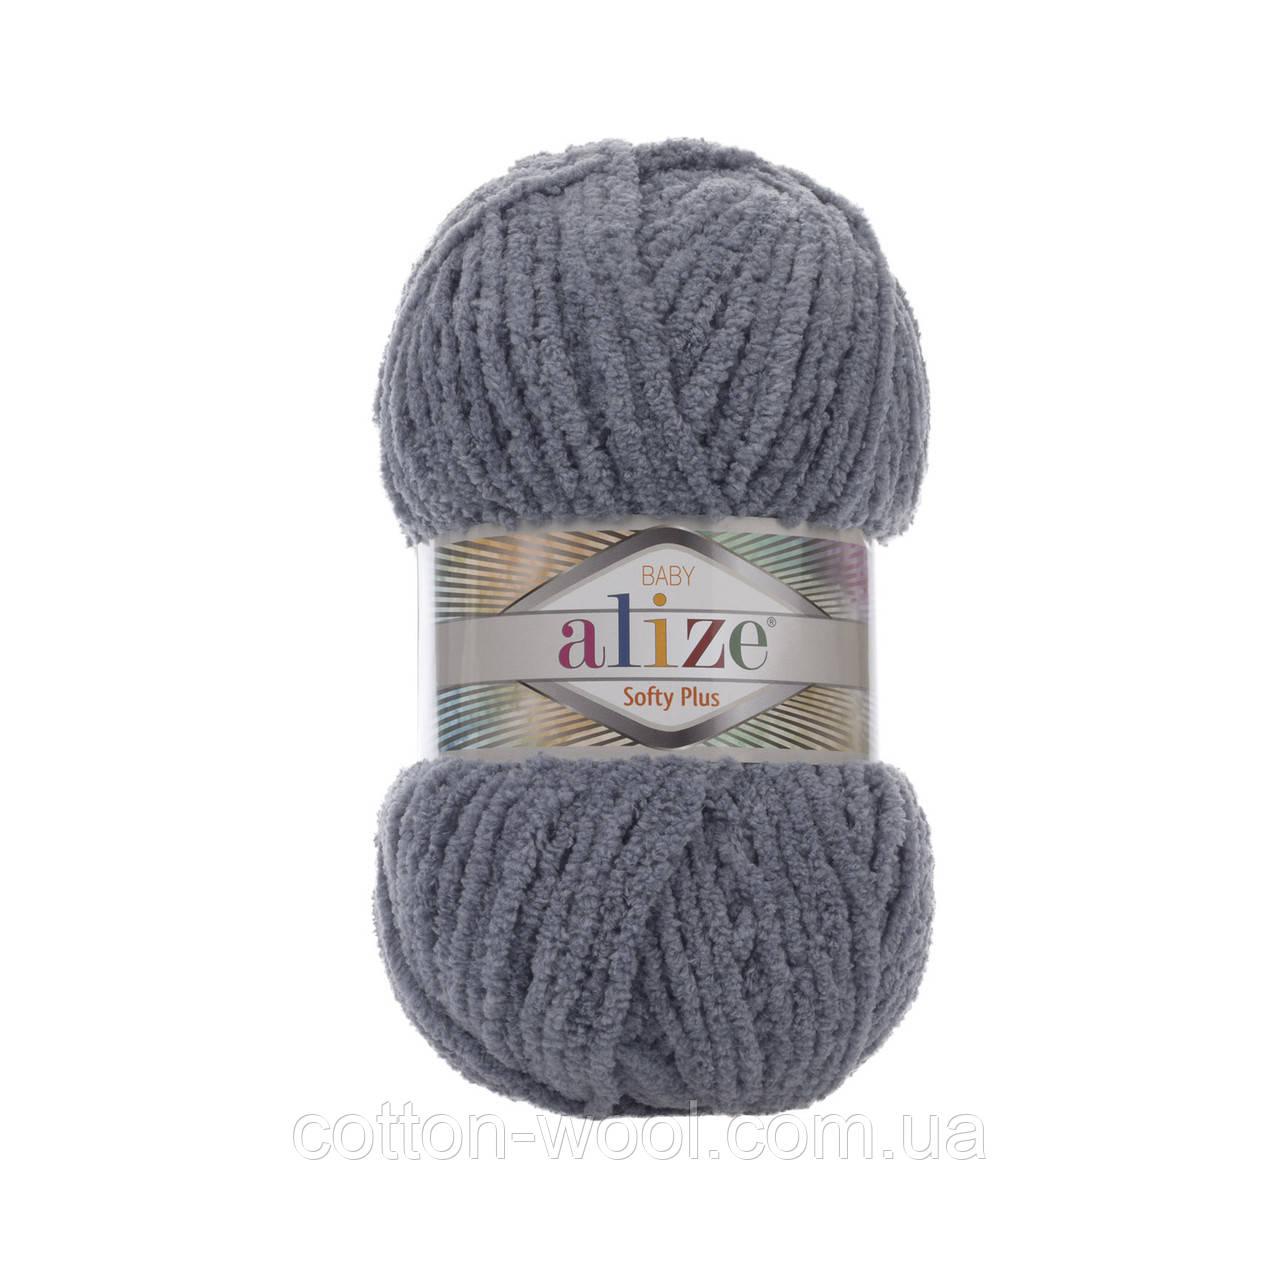 Softy Plus (Софти плюс) 100% - микрополиєстер 87